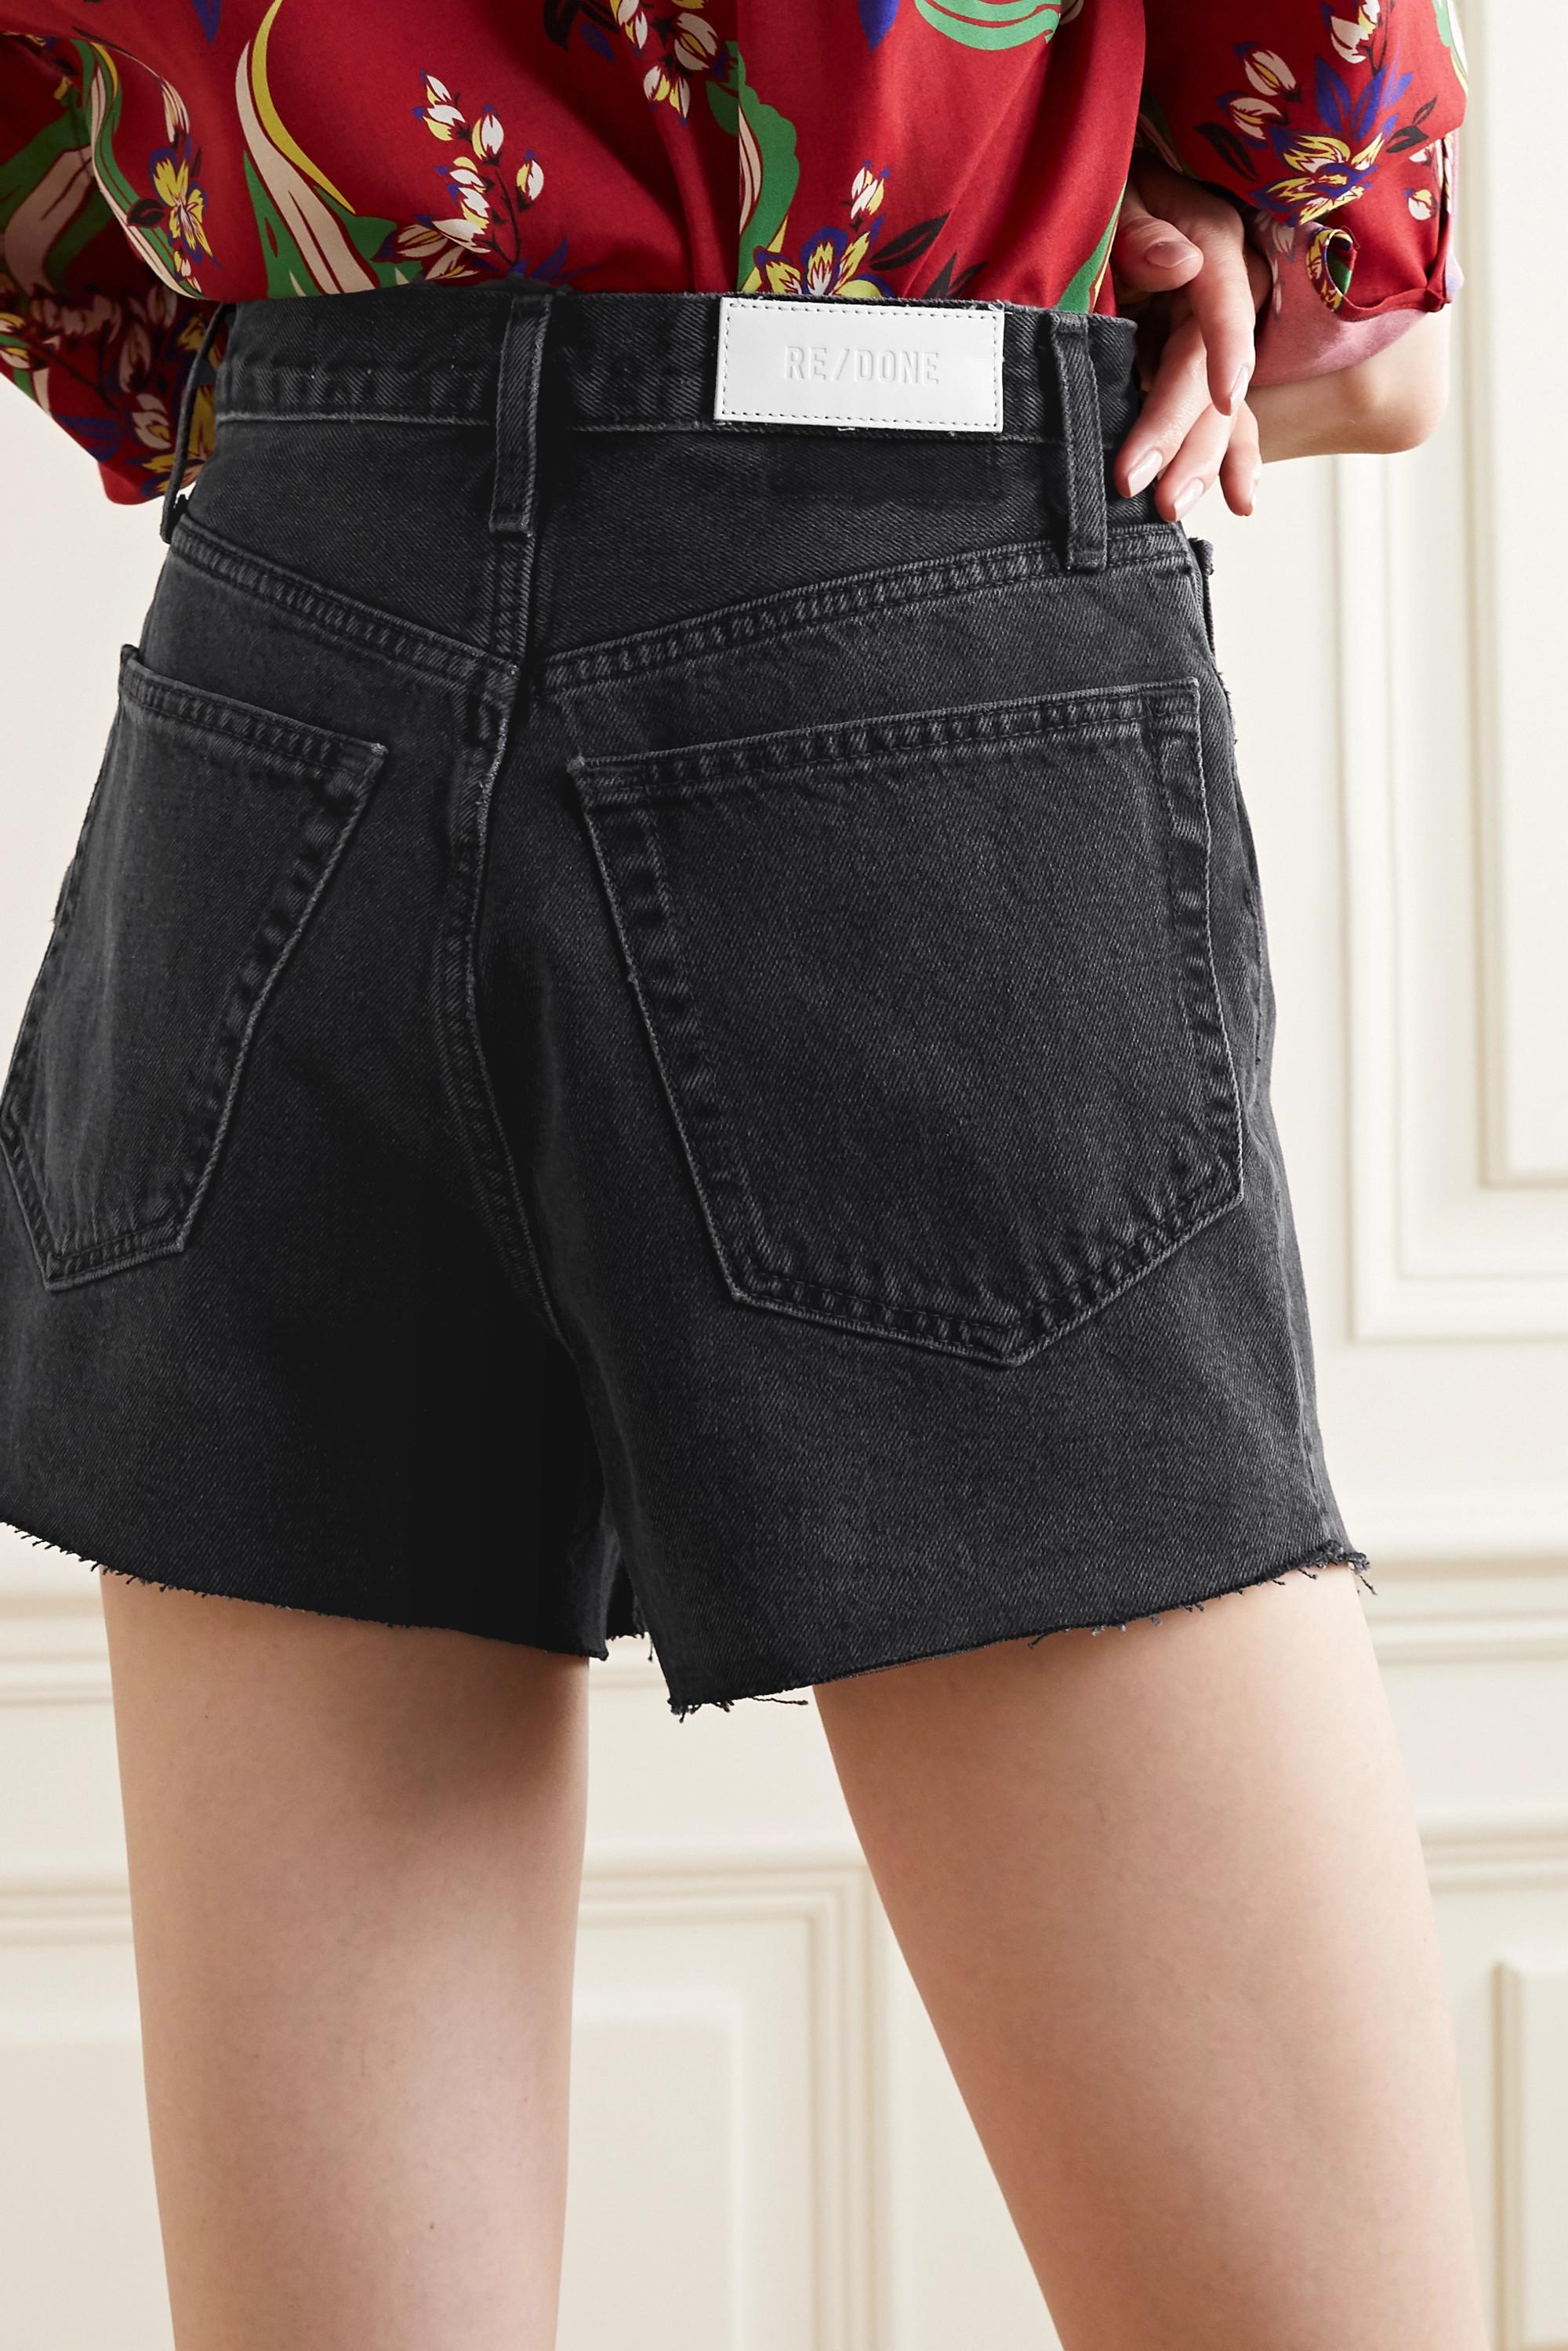 RE/DONE 50s frayed denim shorts